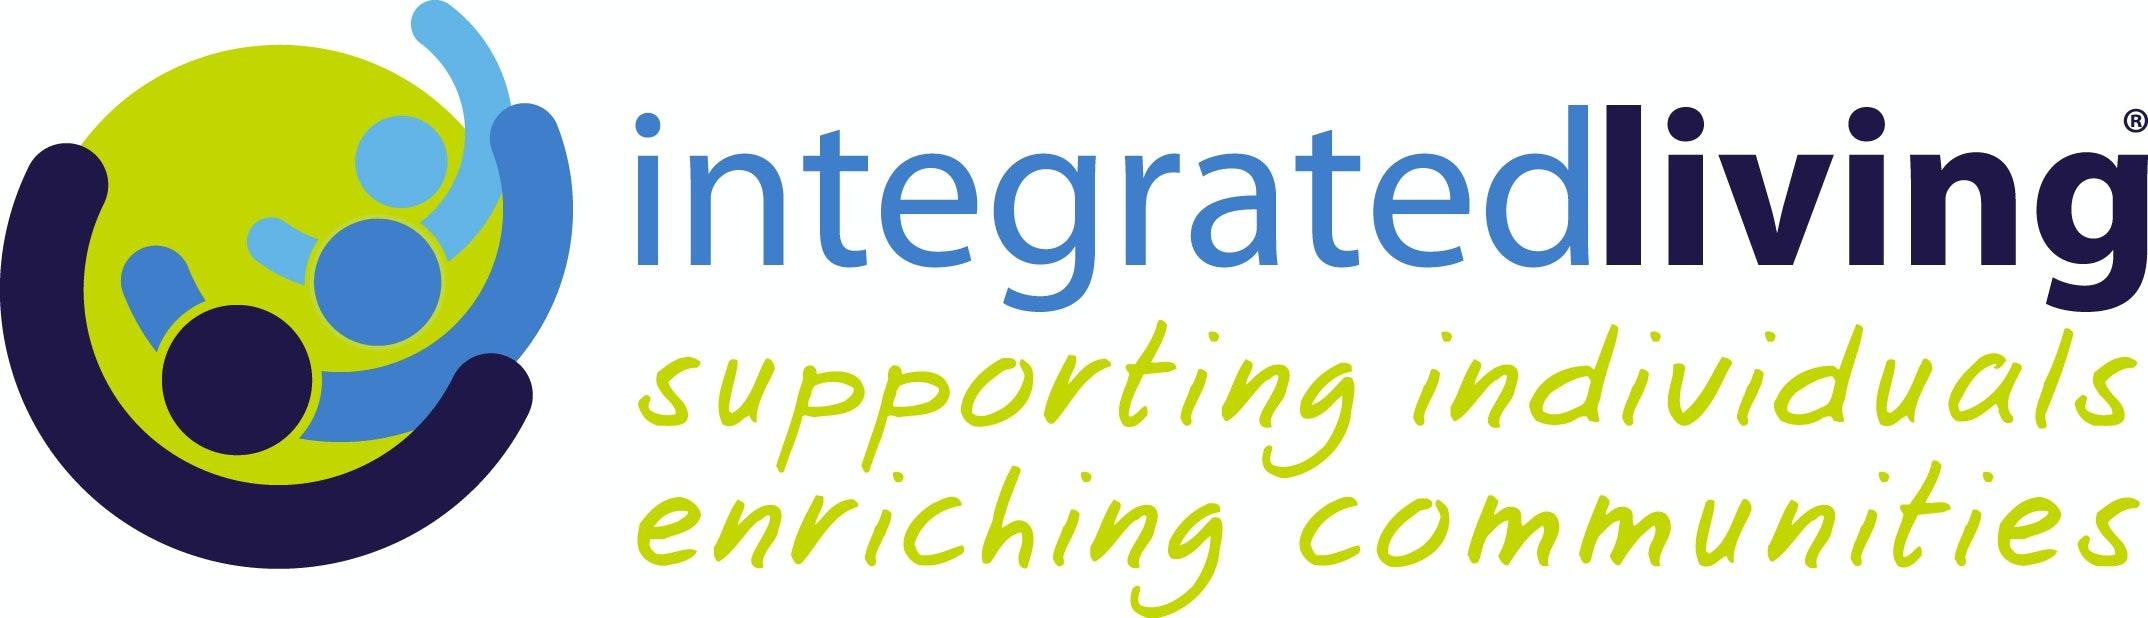 integratedliving Northern Territory logo